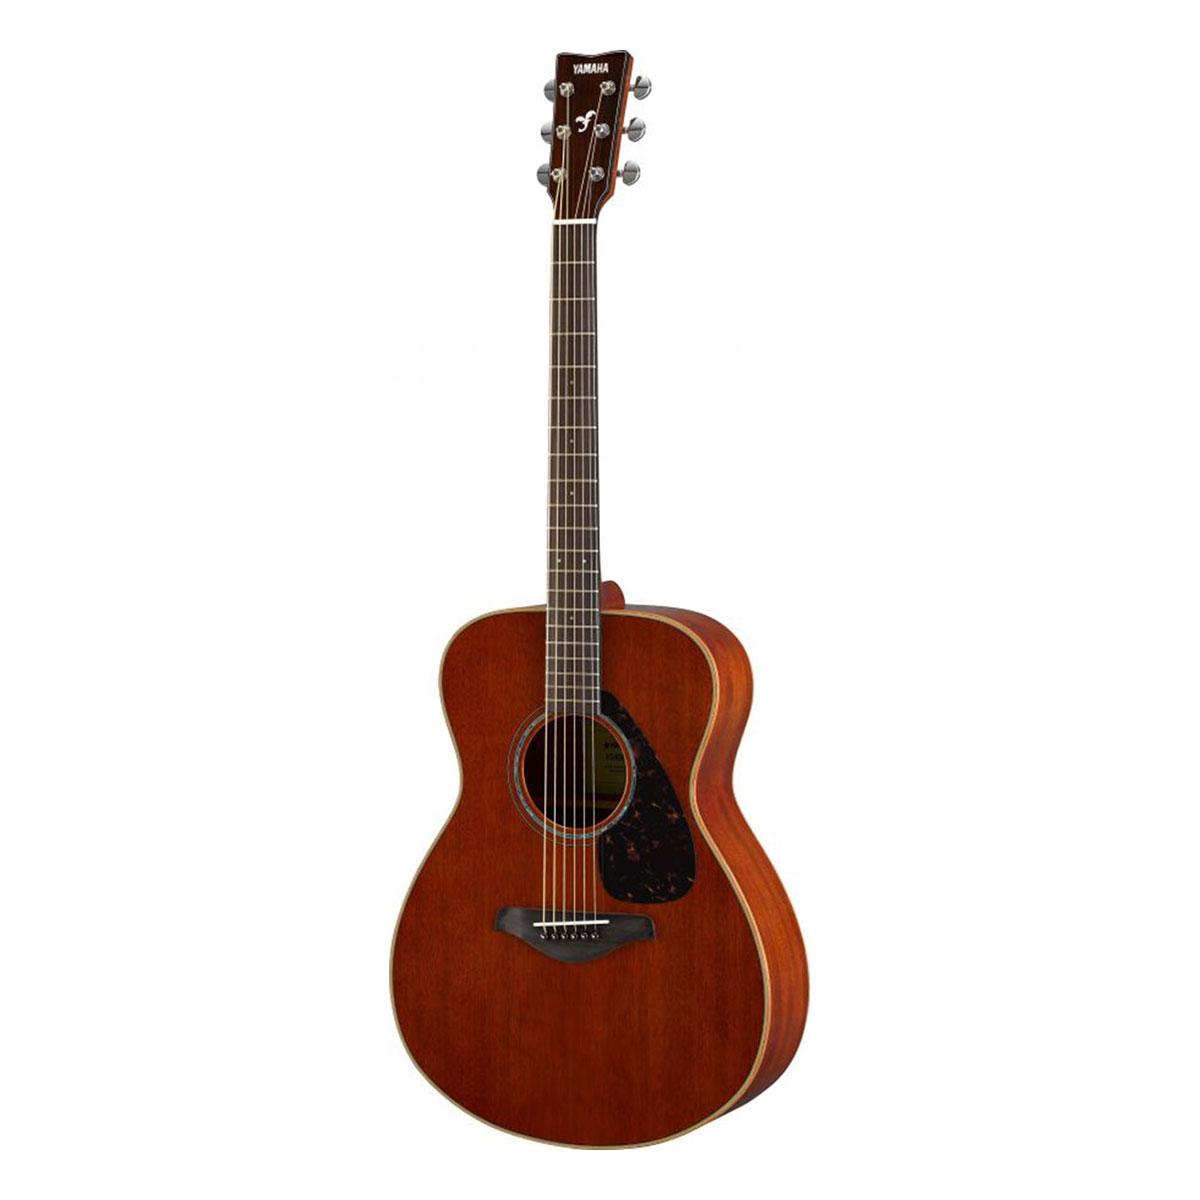 Yamaha - GFS850NT natural - guitare folk T